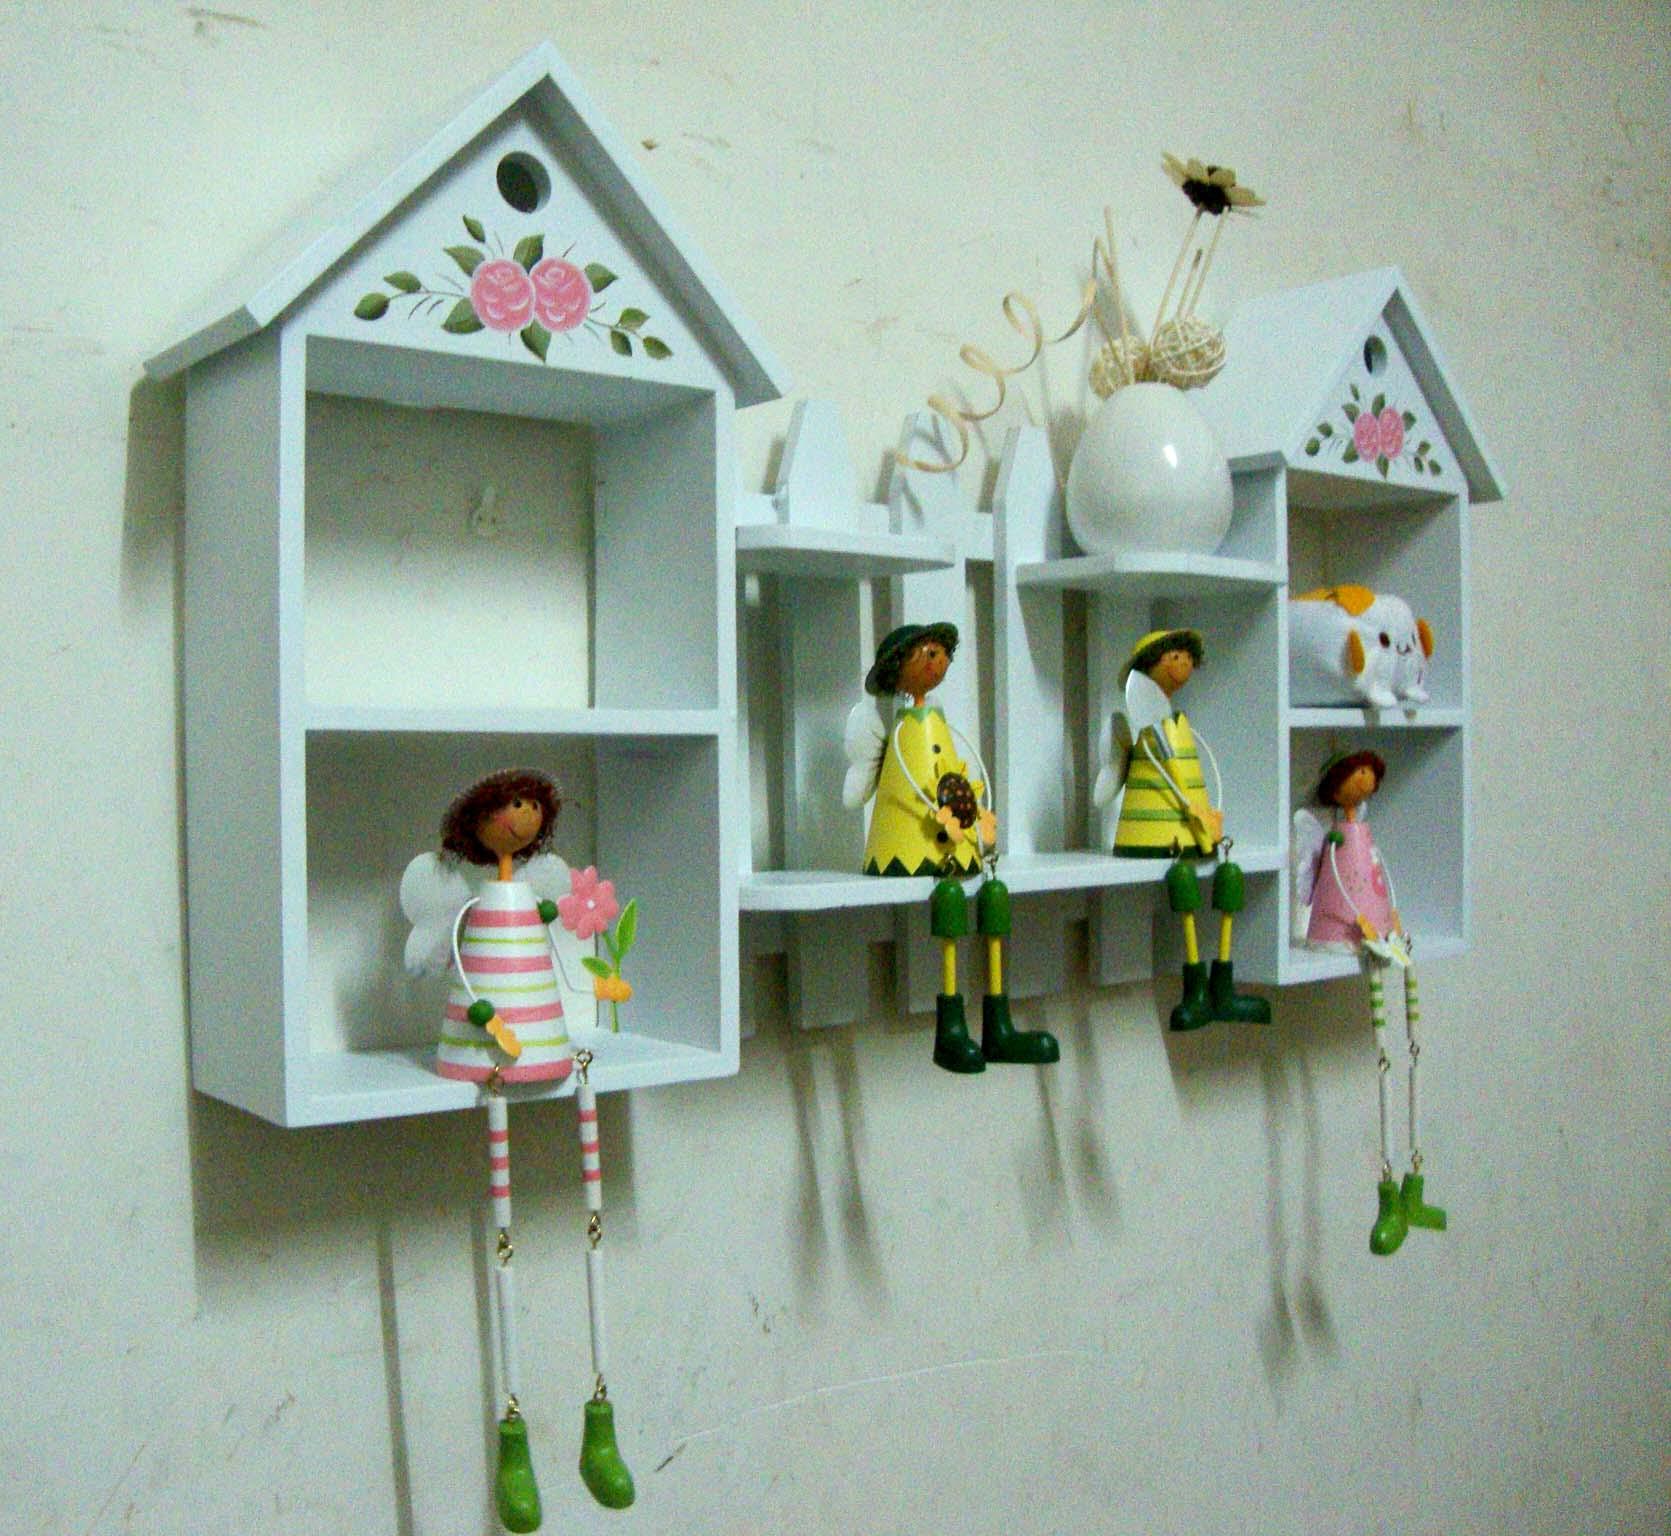 полка 田园装饰架 隔板 置物架 创意家居 壁挂架 墙架 搁板儿童房装饰架